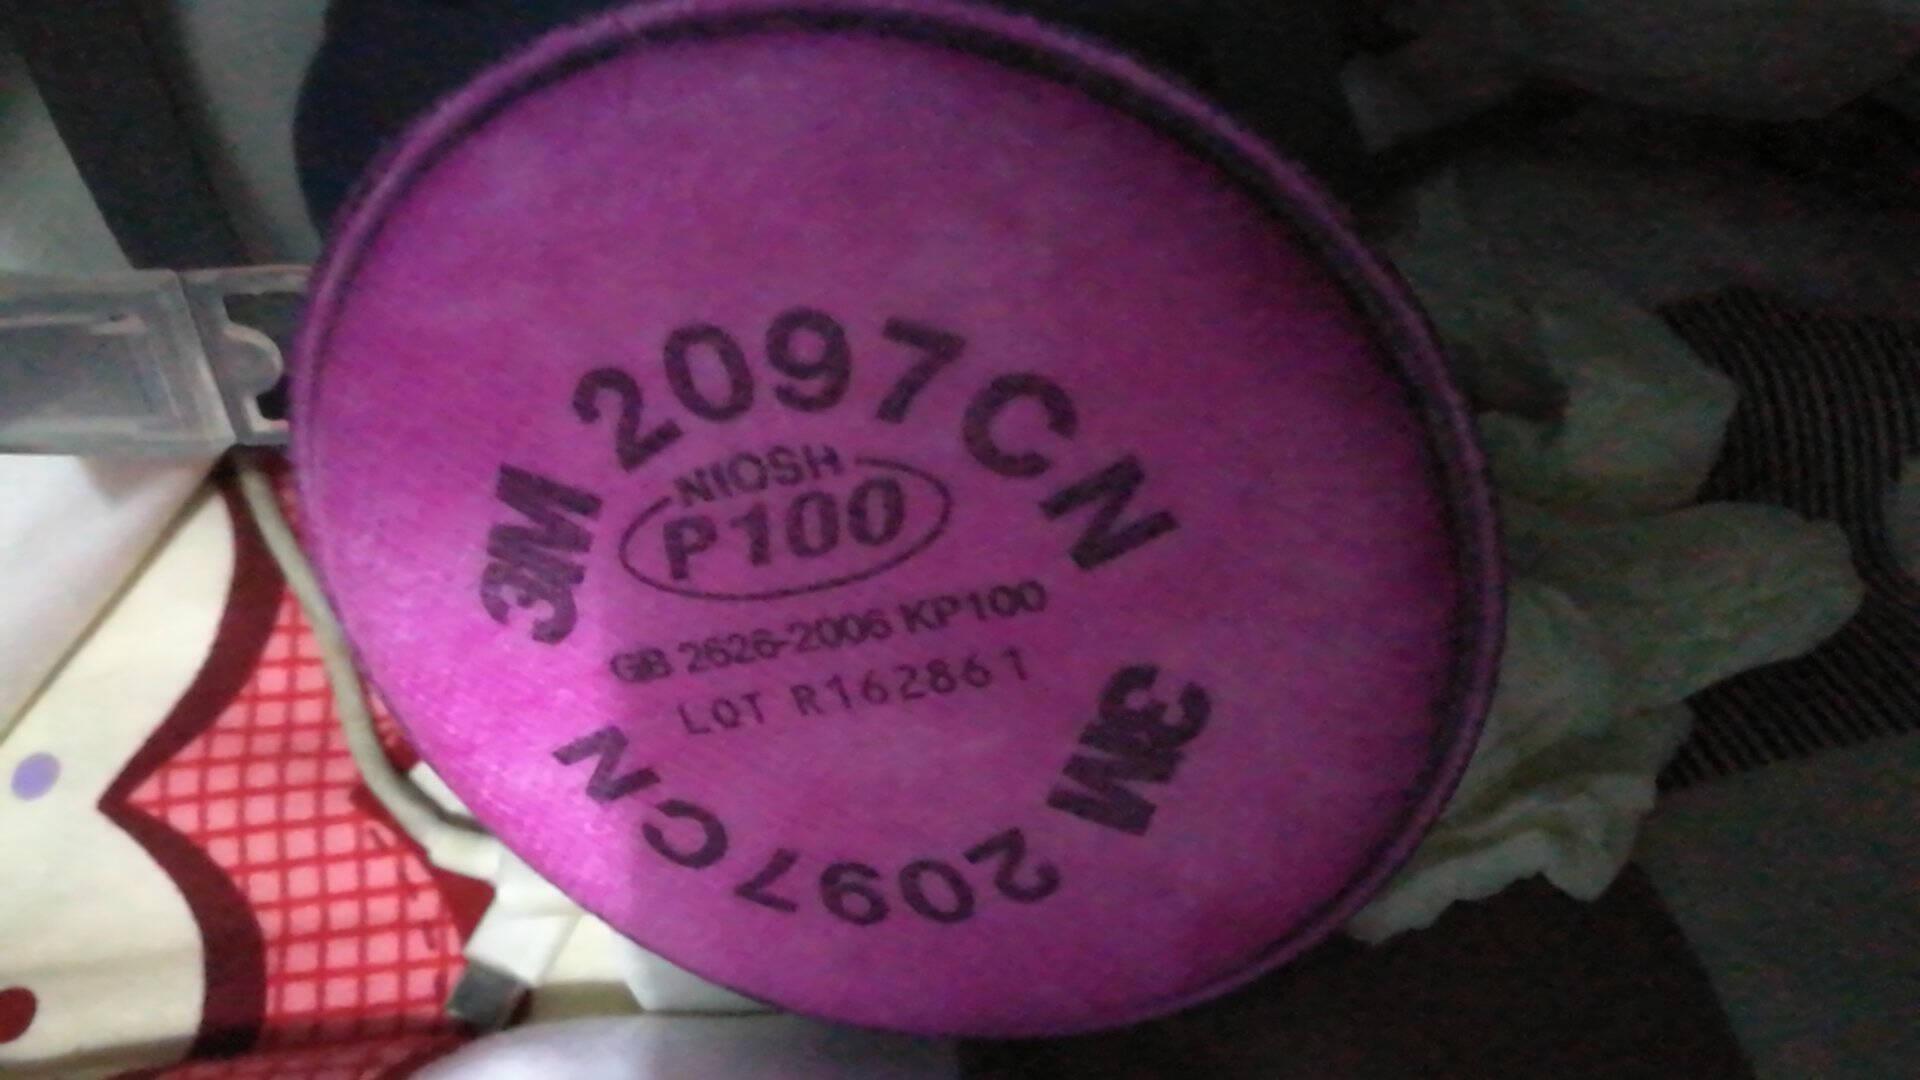 3M2091滤棉电焊烟玻璃纤维石棉打磨煤矿雾霾620065027502等面具可使用2097防尘滤棉(活性炭减除有机气味)2片(一包)